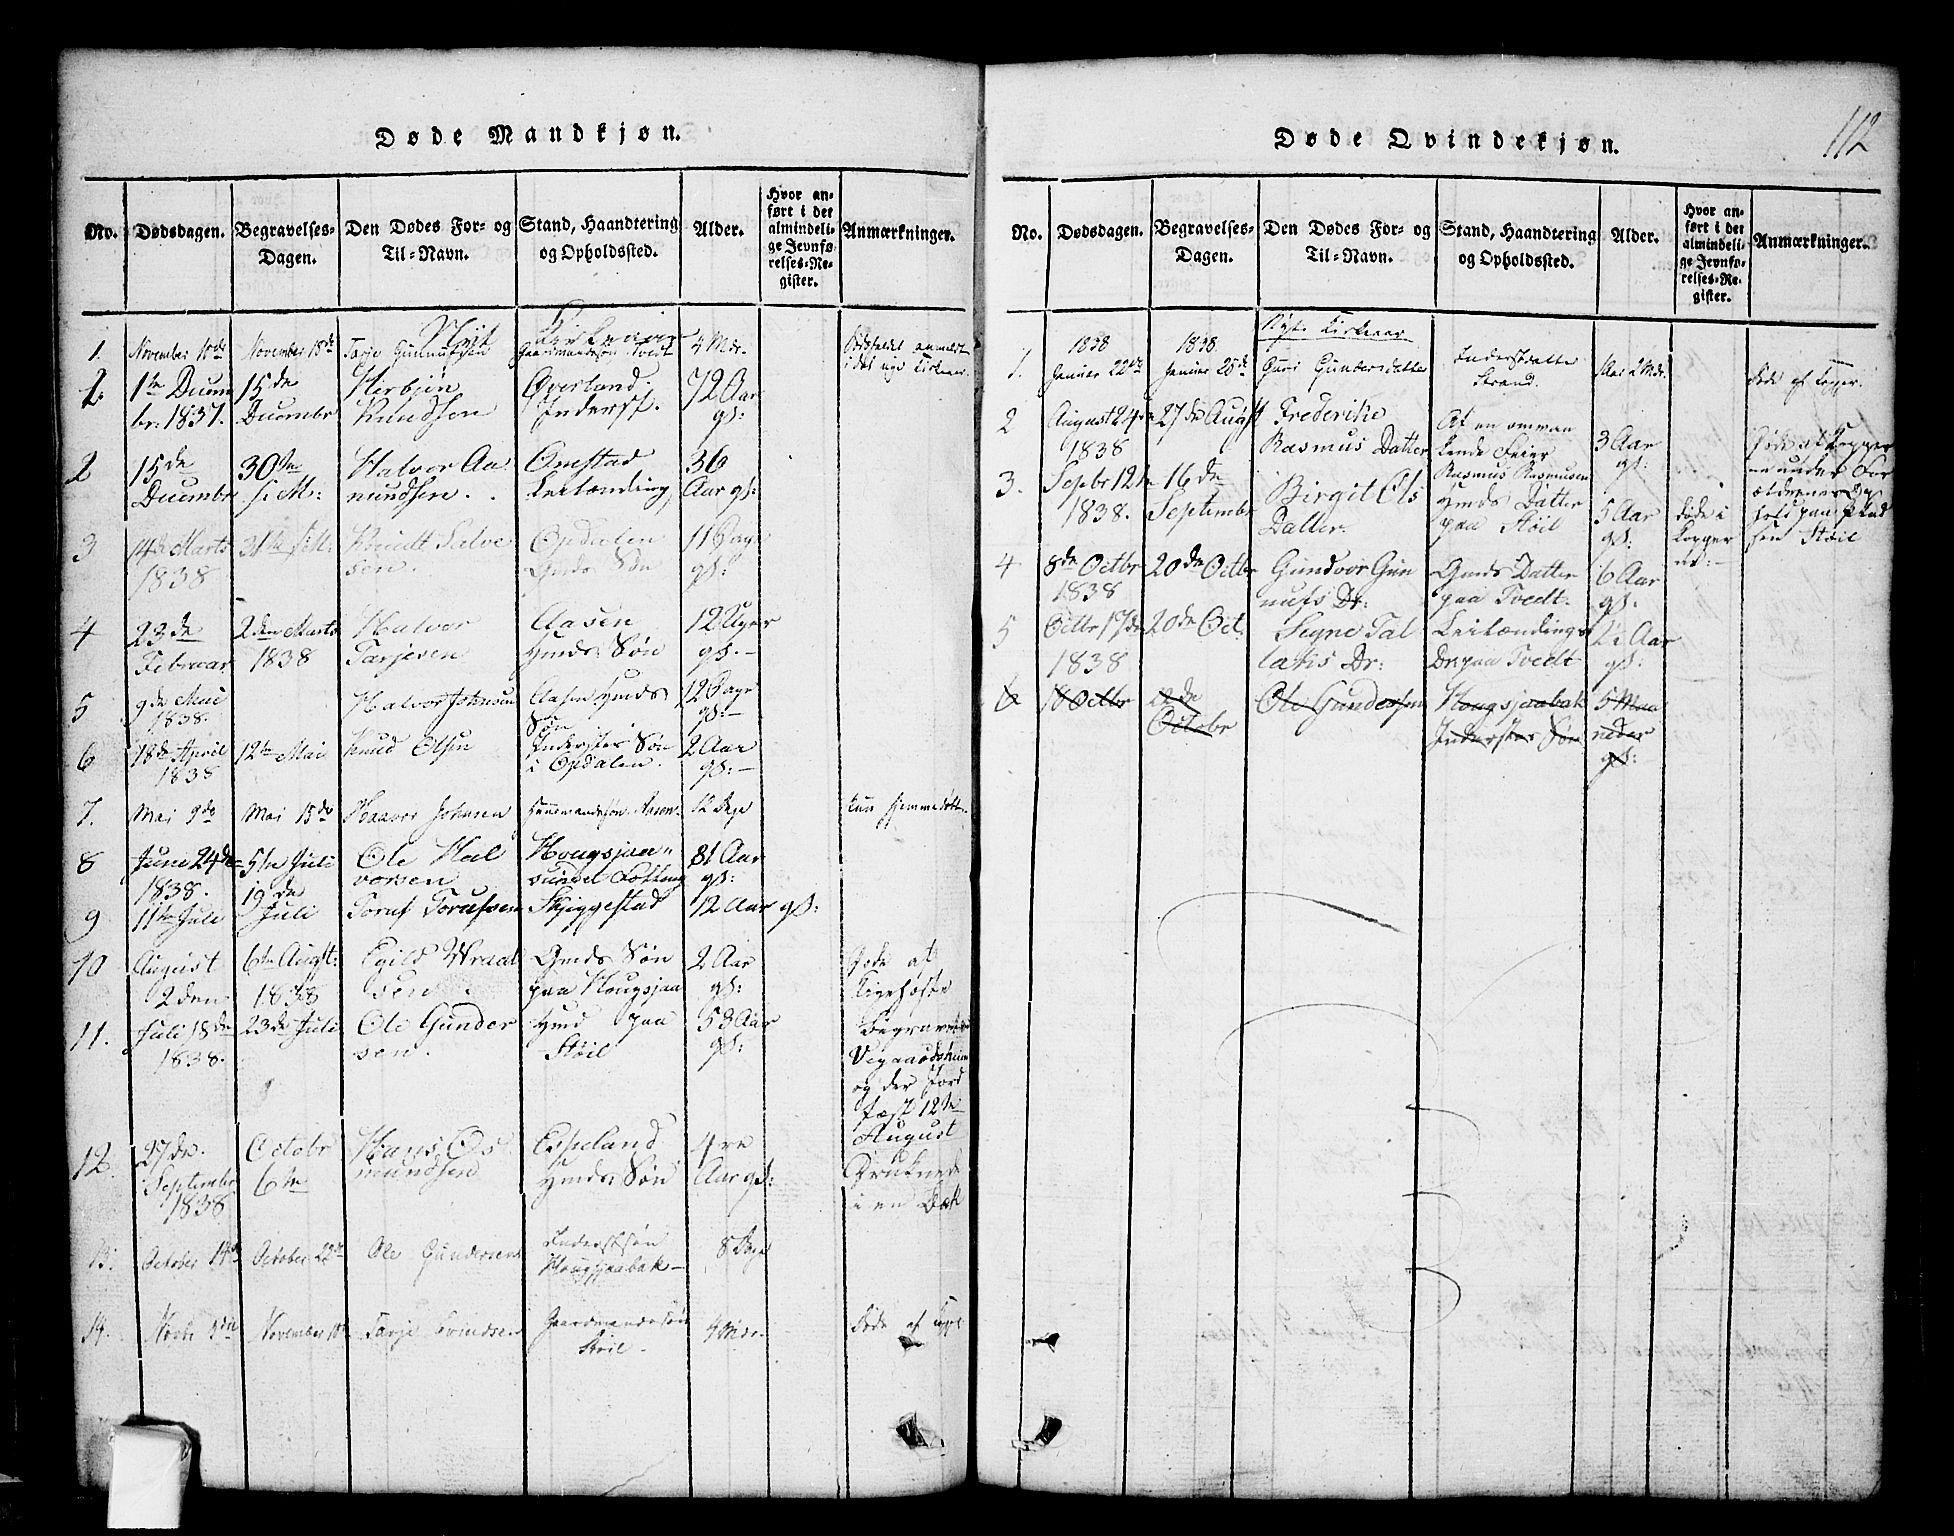 SAKO, Nissedal kirkebøker, G/Gb/L0001: Klokkerbok nr. II 1, 1814-1862, s. 112